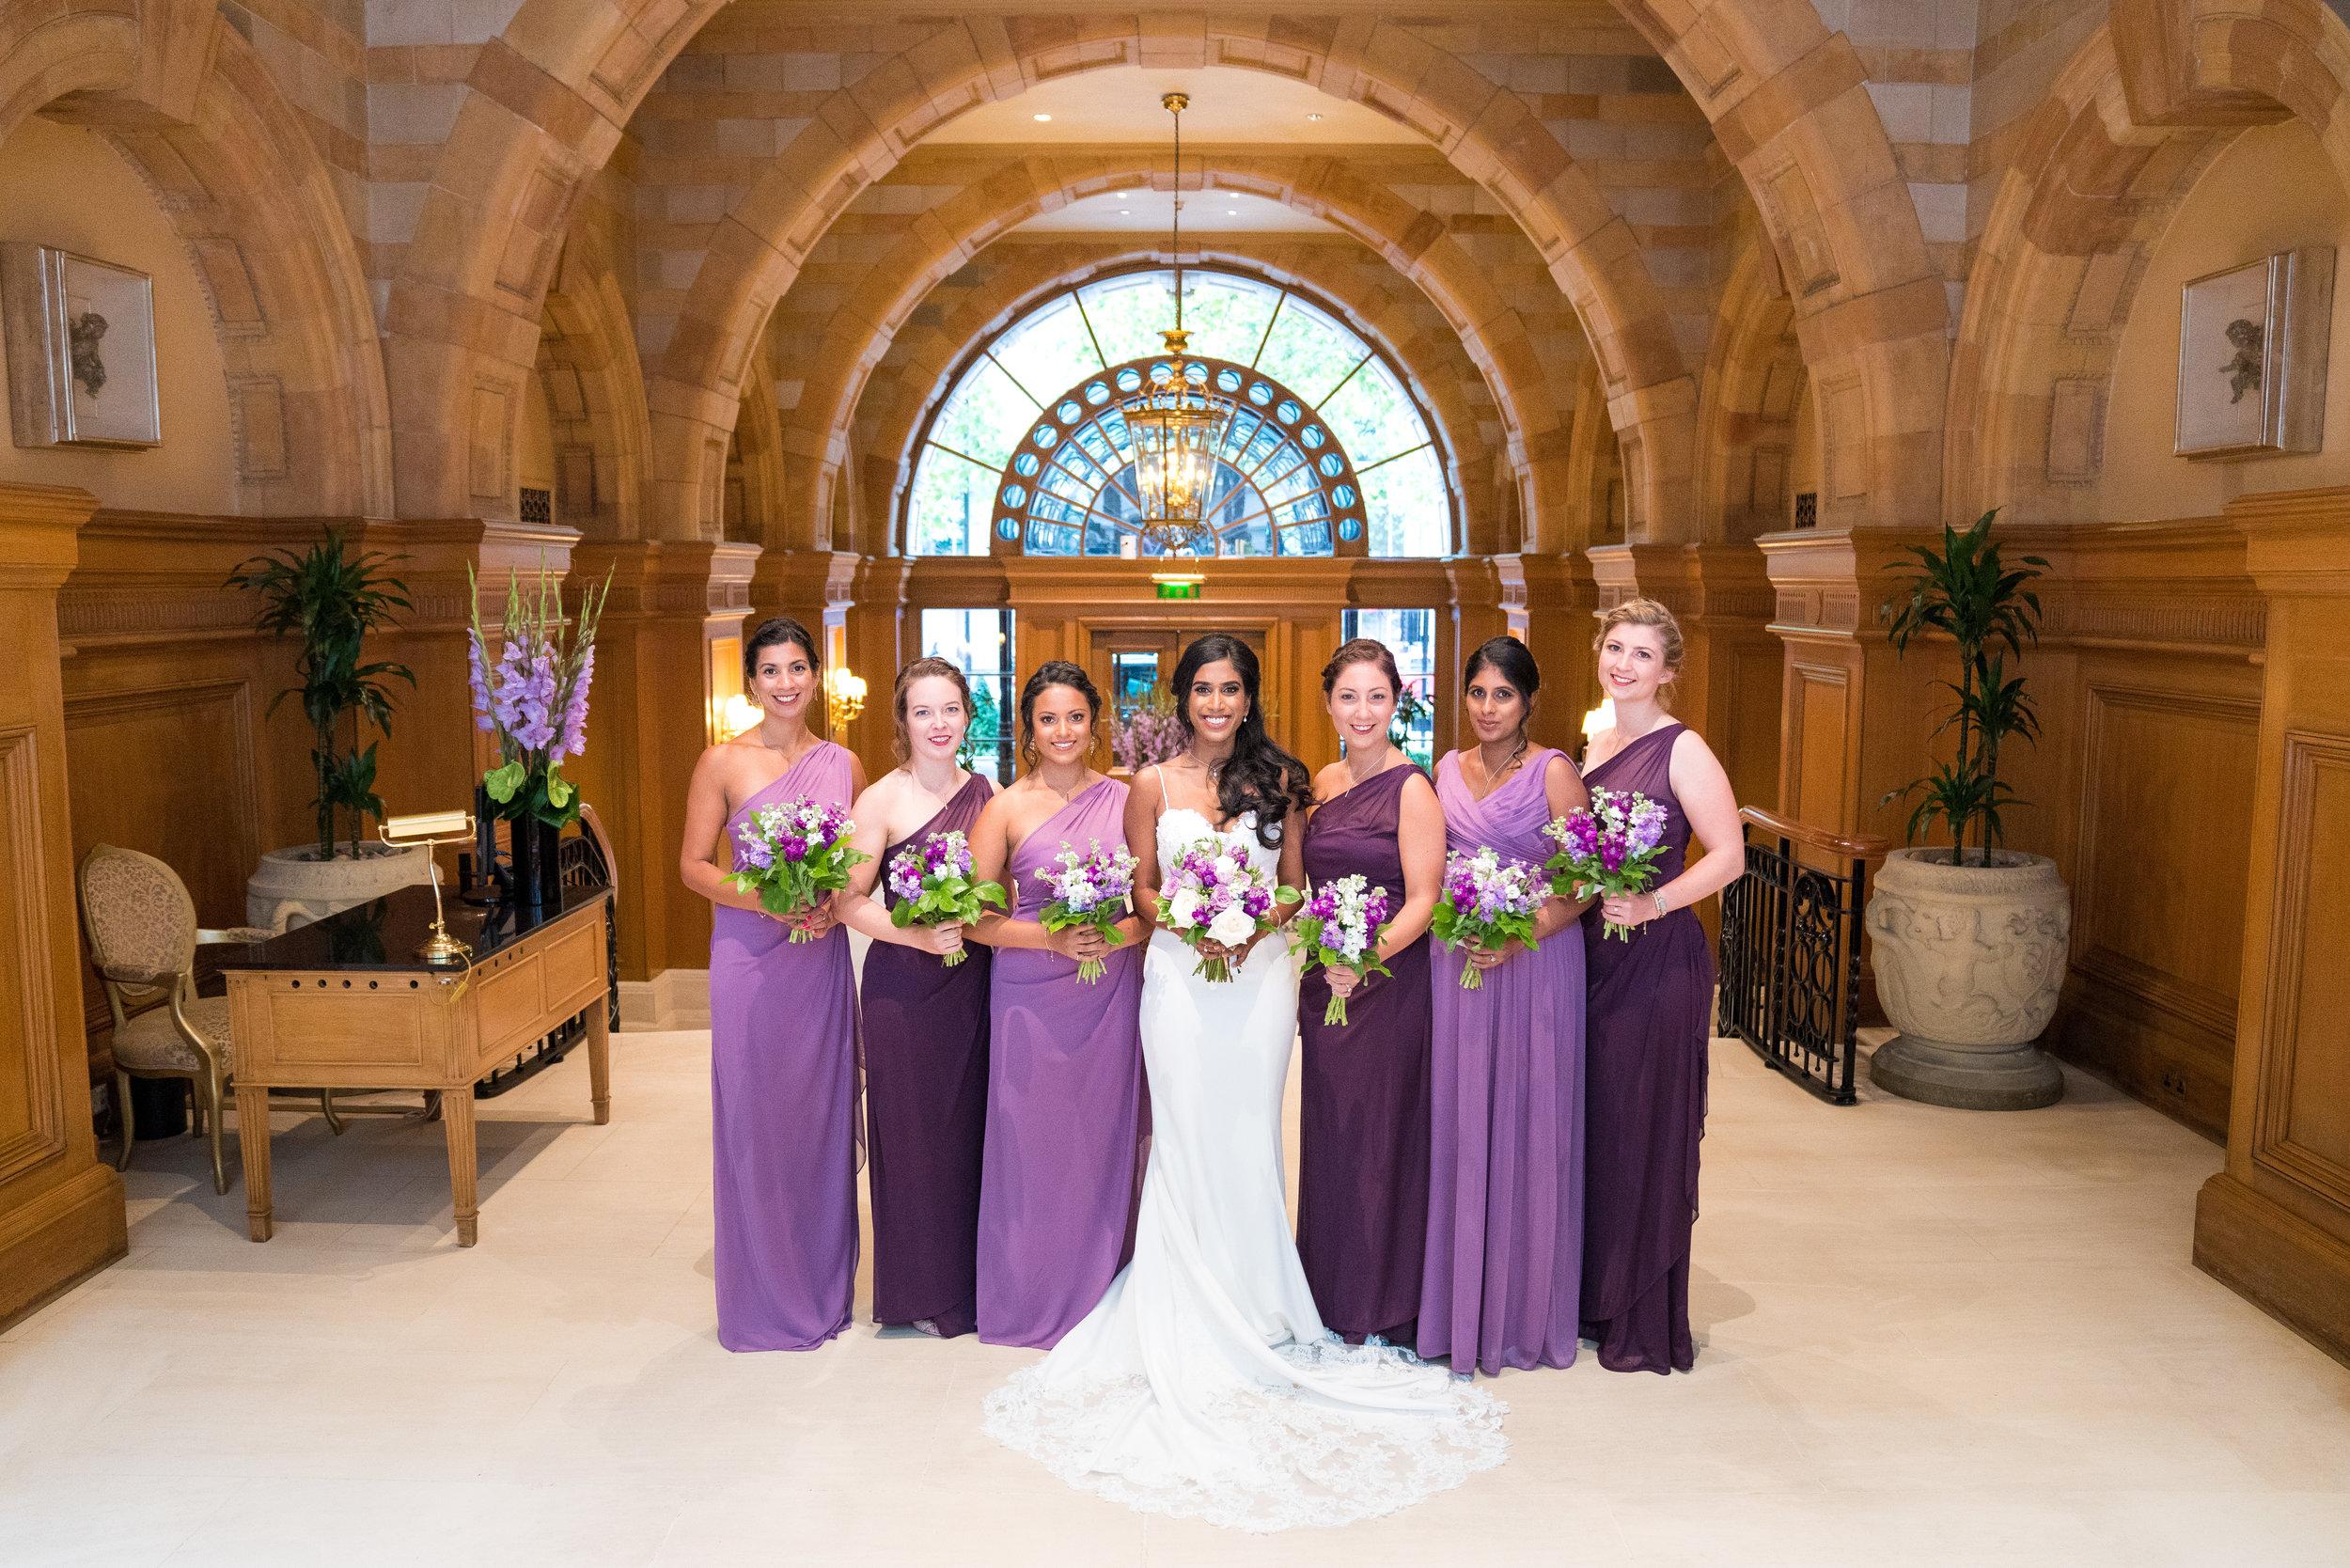 anglo-asian-hindu-civil-wedding-photography-videography-london-portrait-marylebone-old-town-hall-landmark-hotel-19